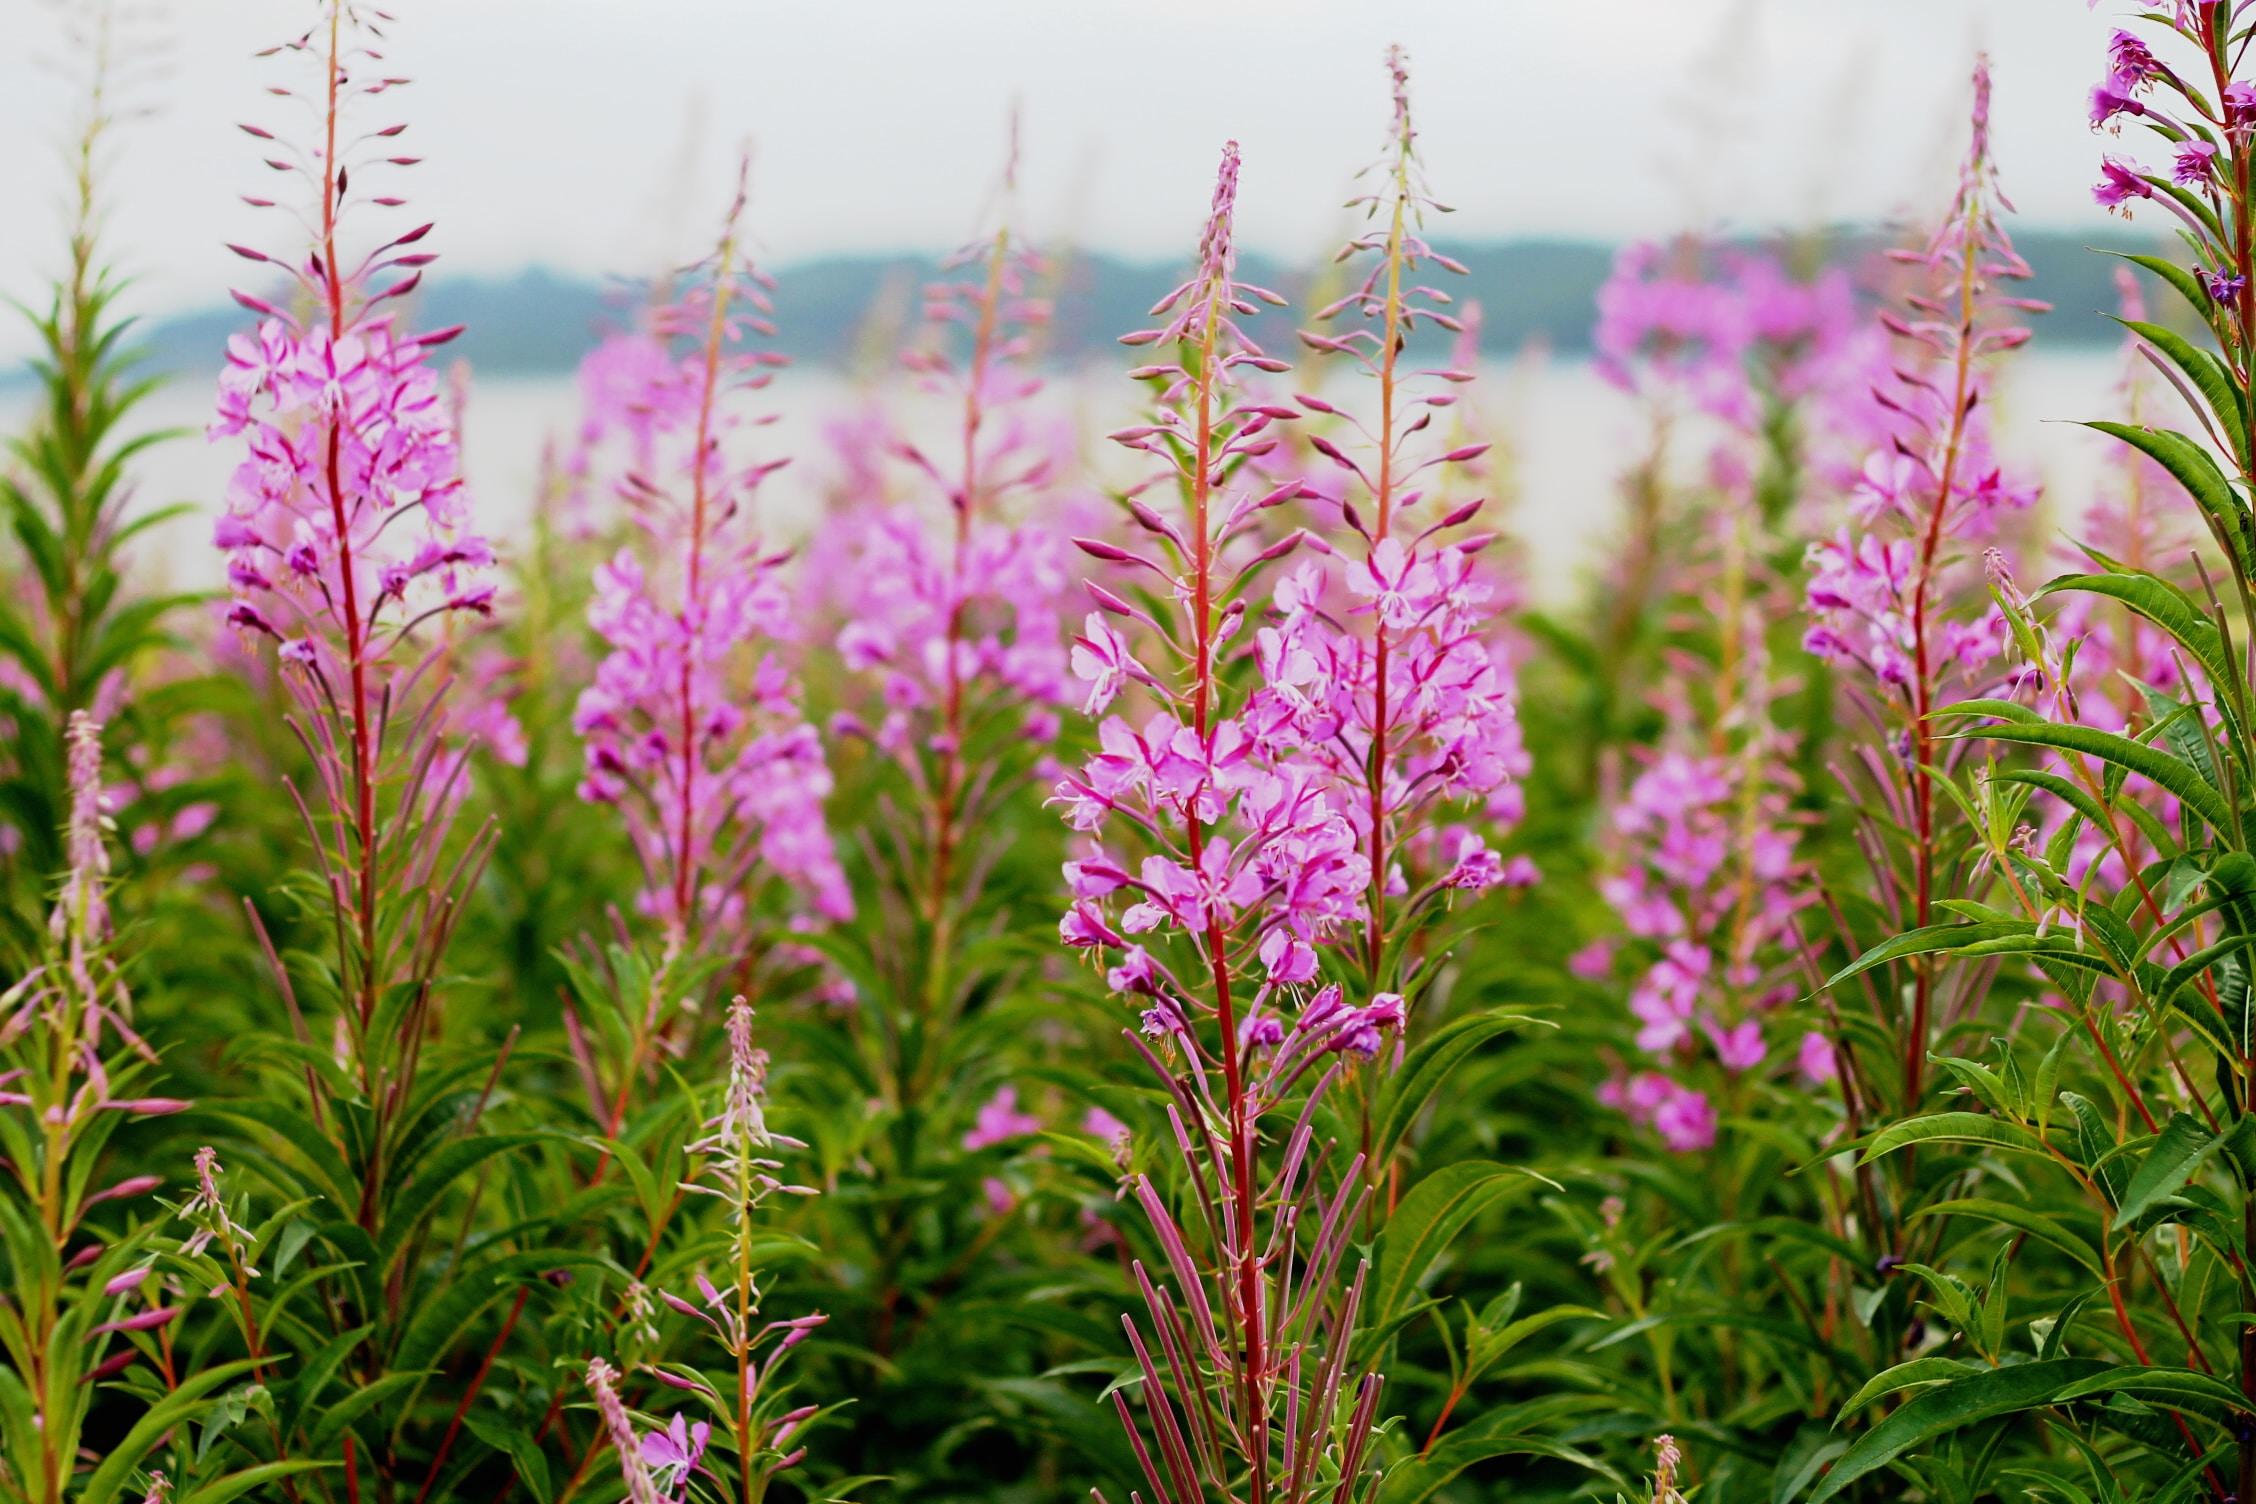 Purple flowers with green leaves bloom near the water in Denmark